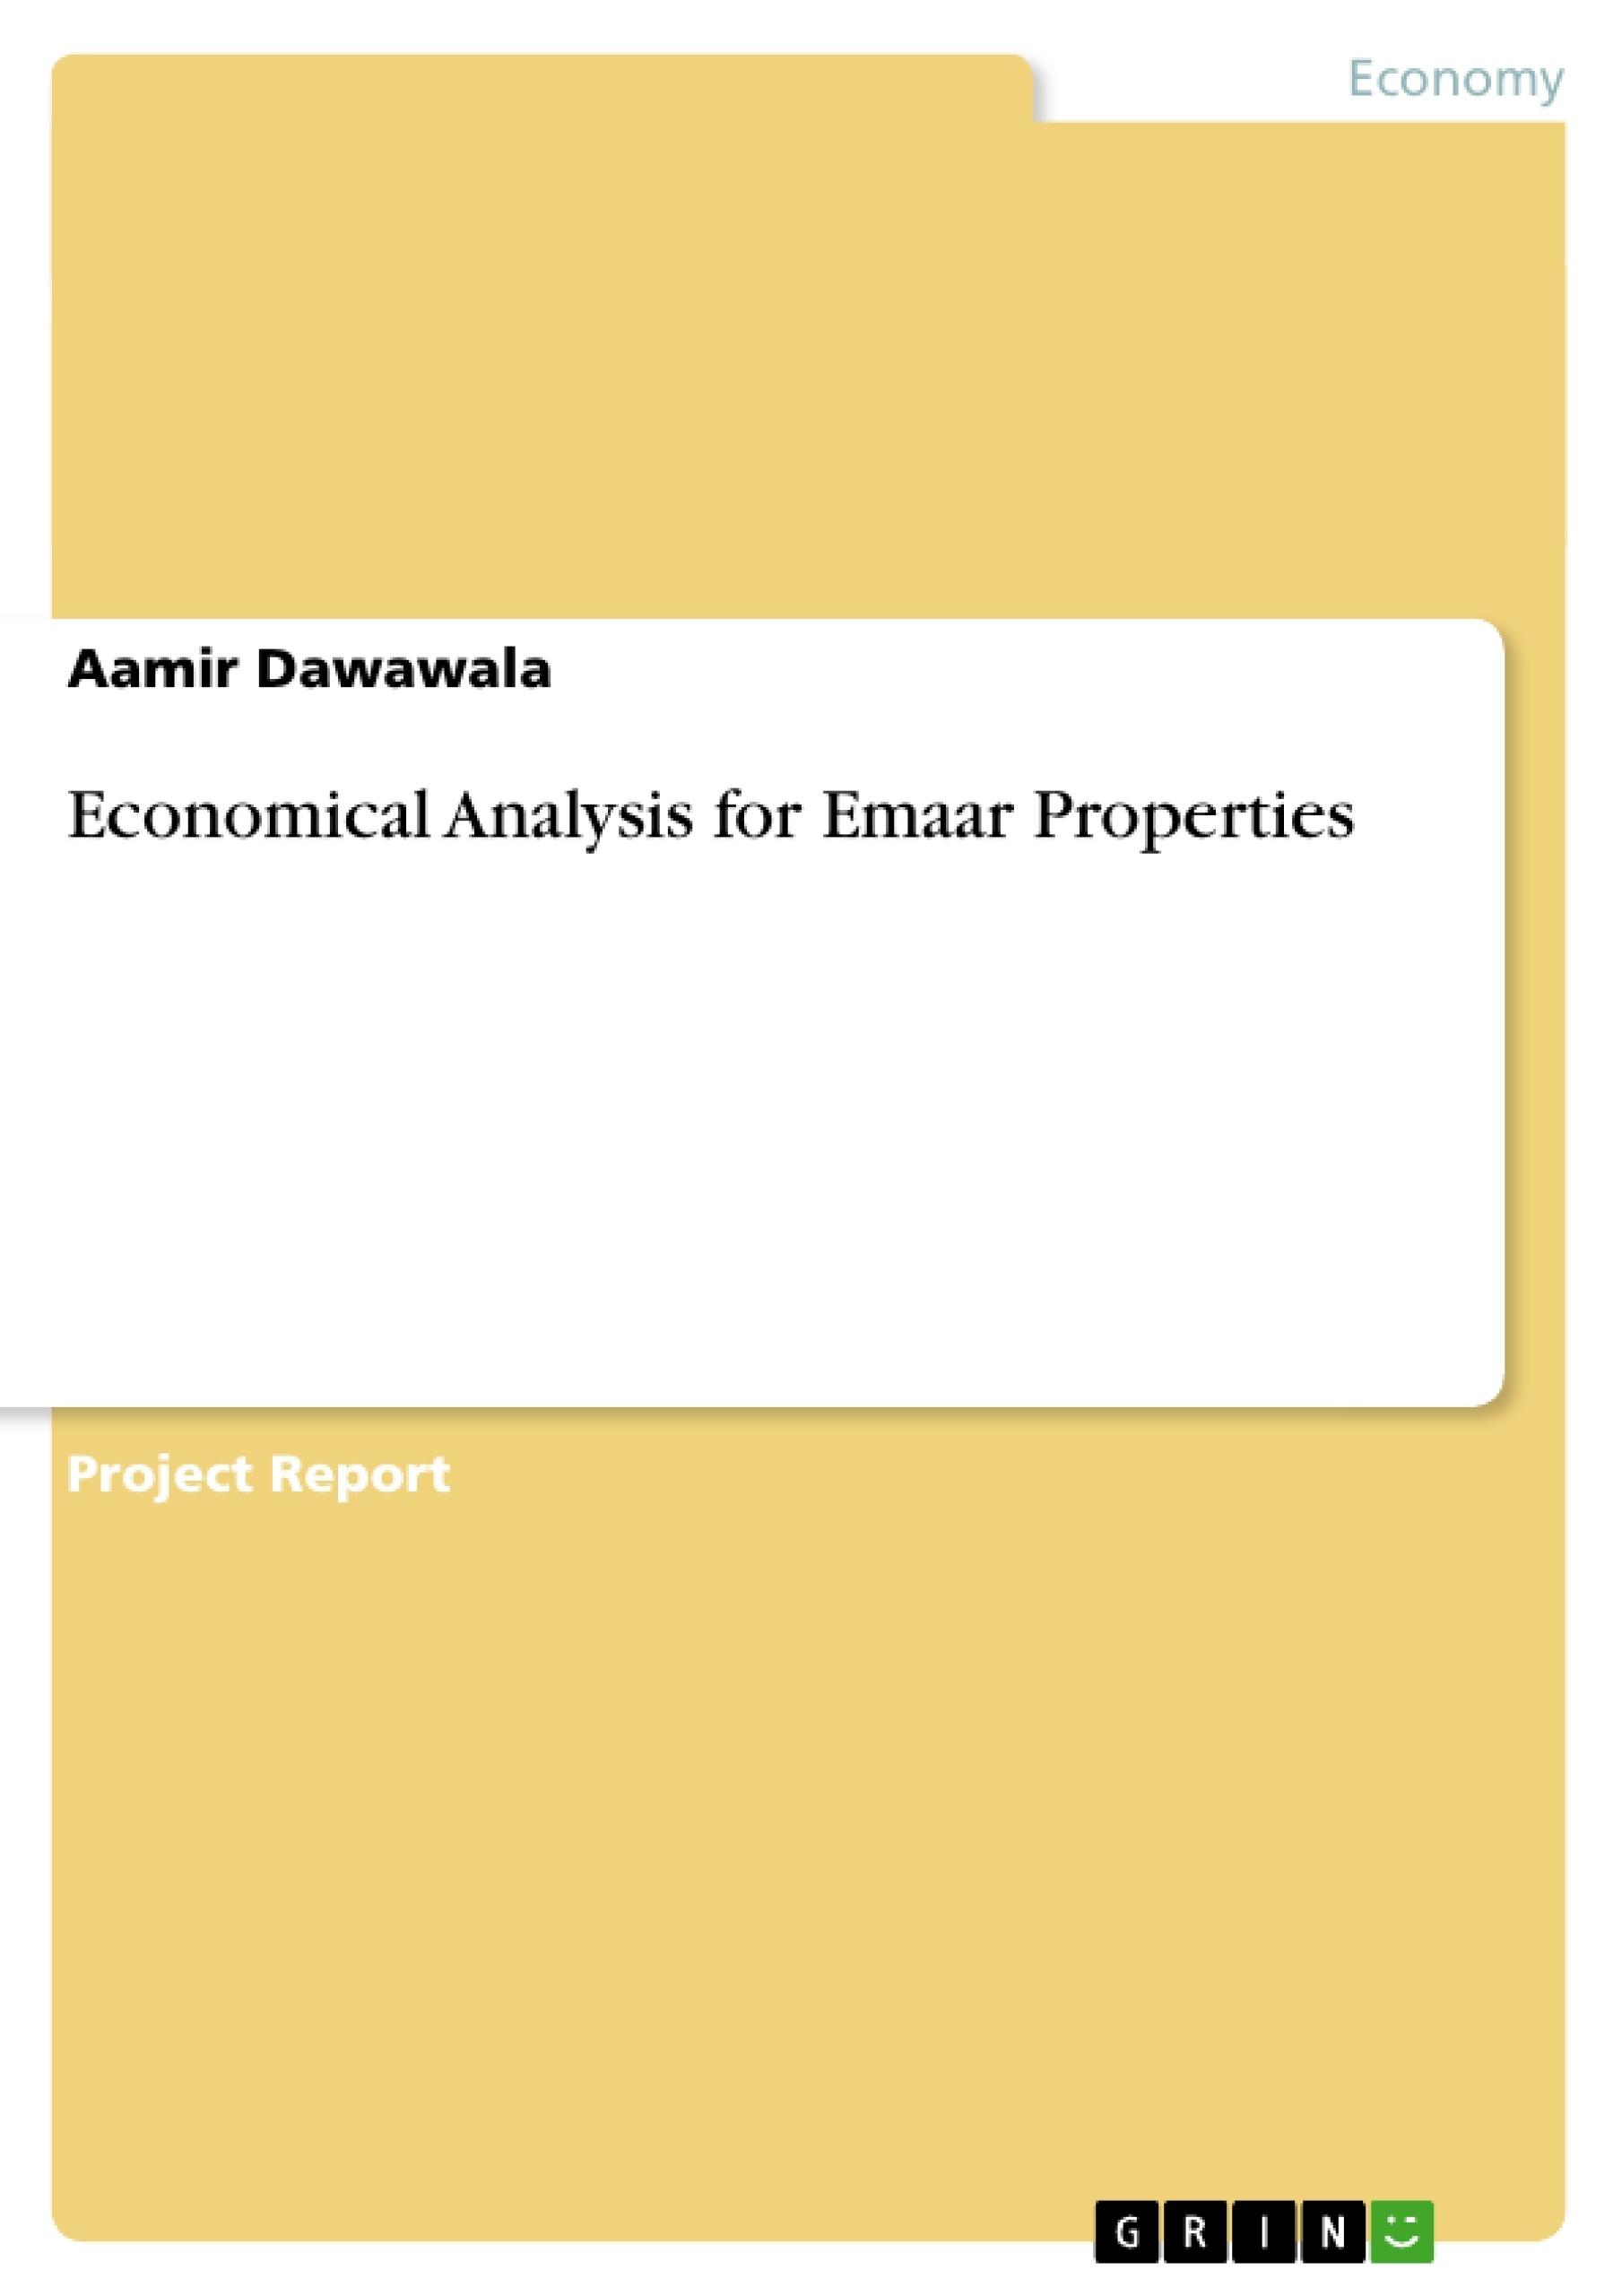 Title: Economical Analysis for Emaar Properties